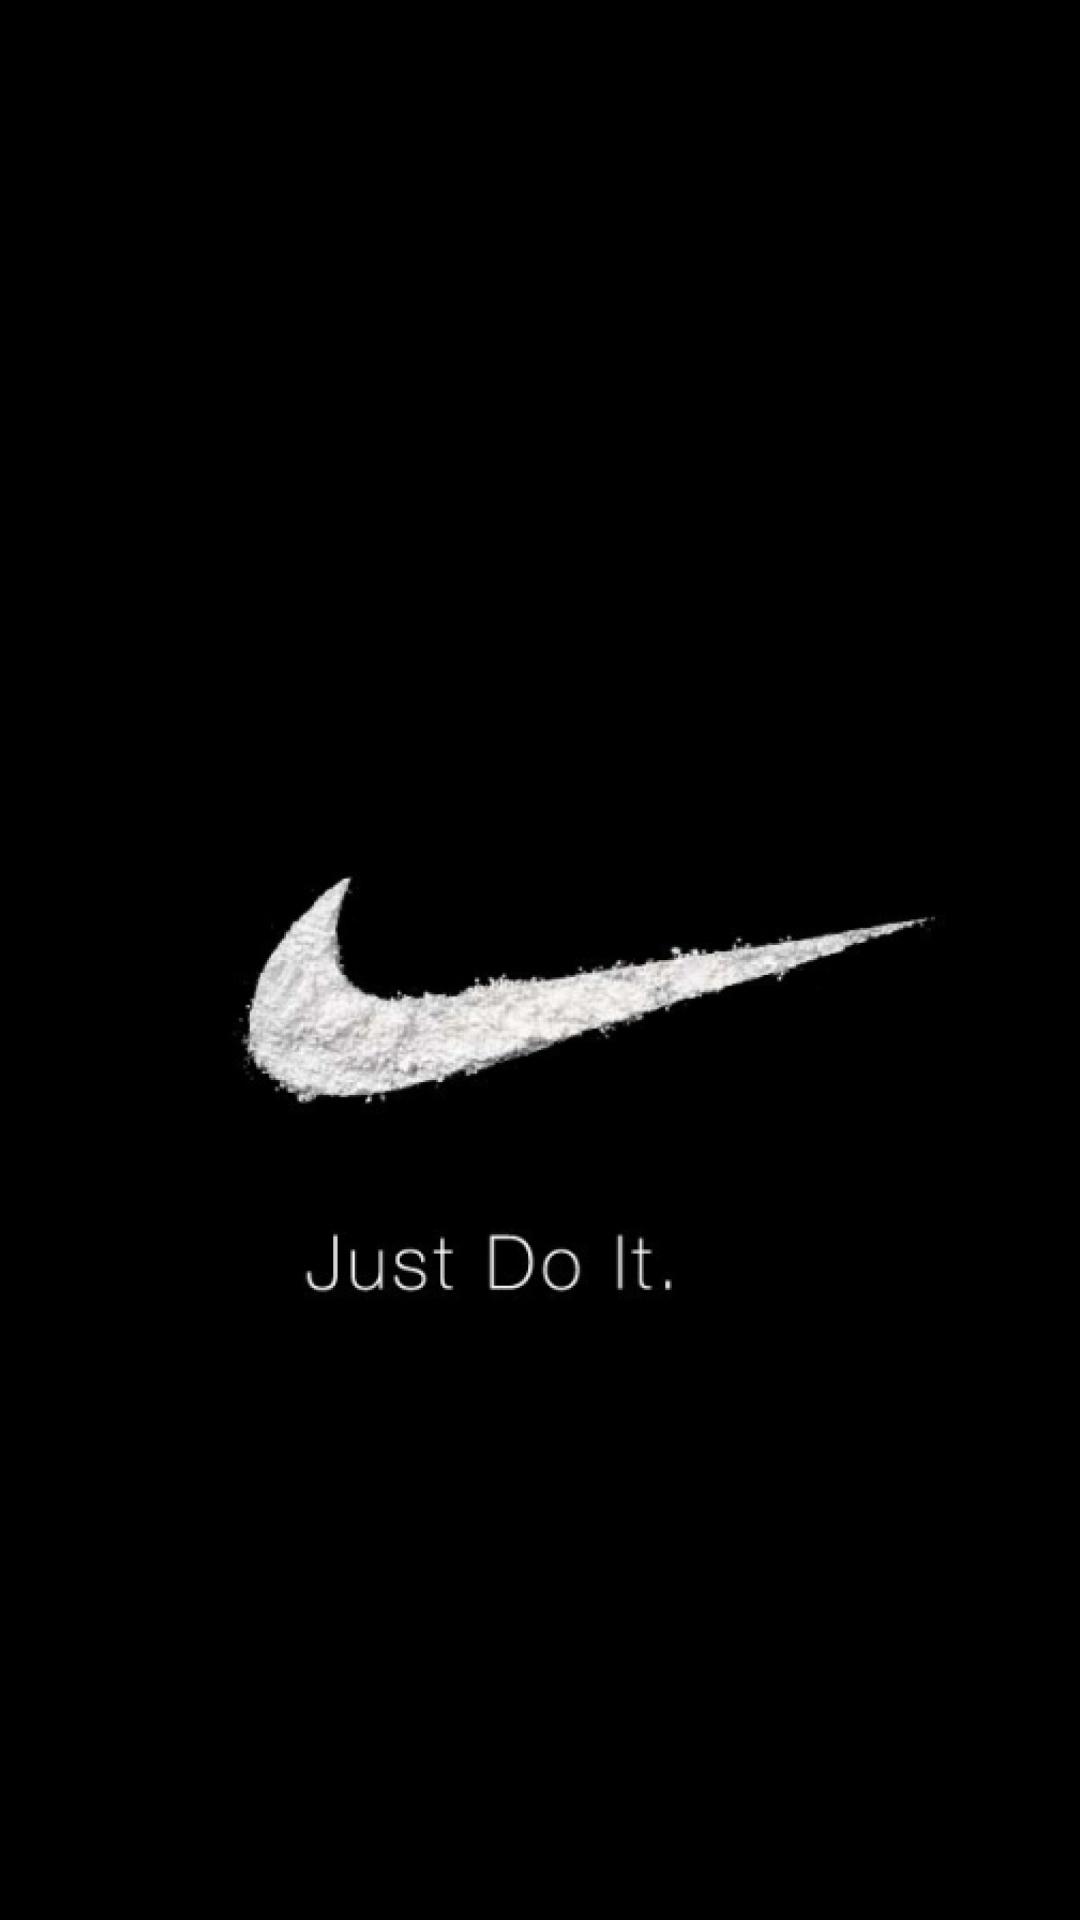 Shameless Quotes Phone Wallpaper Nike Logo Hd Wallpaper For 1080x1920